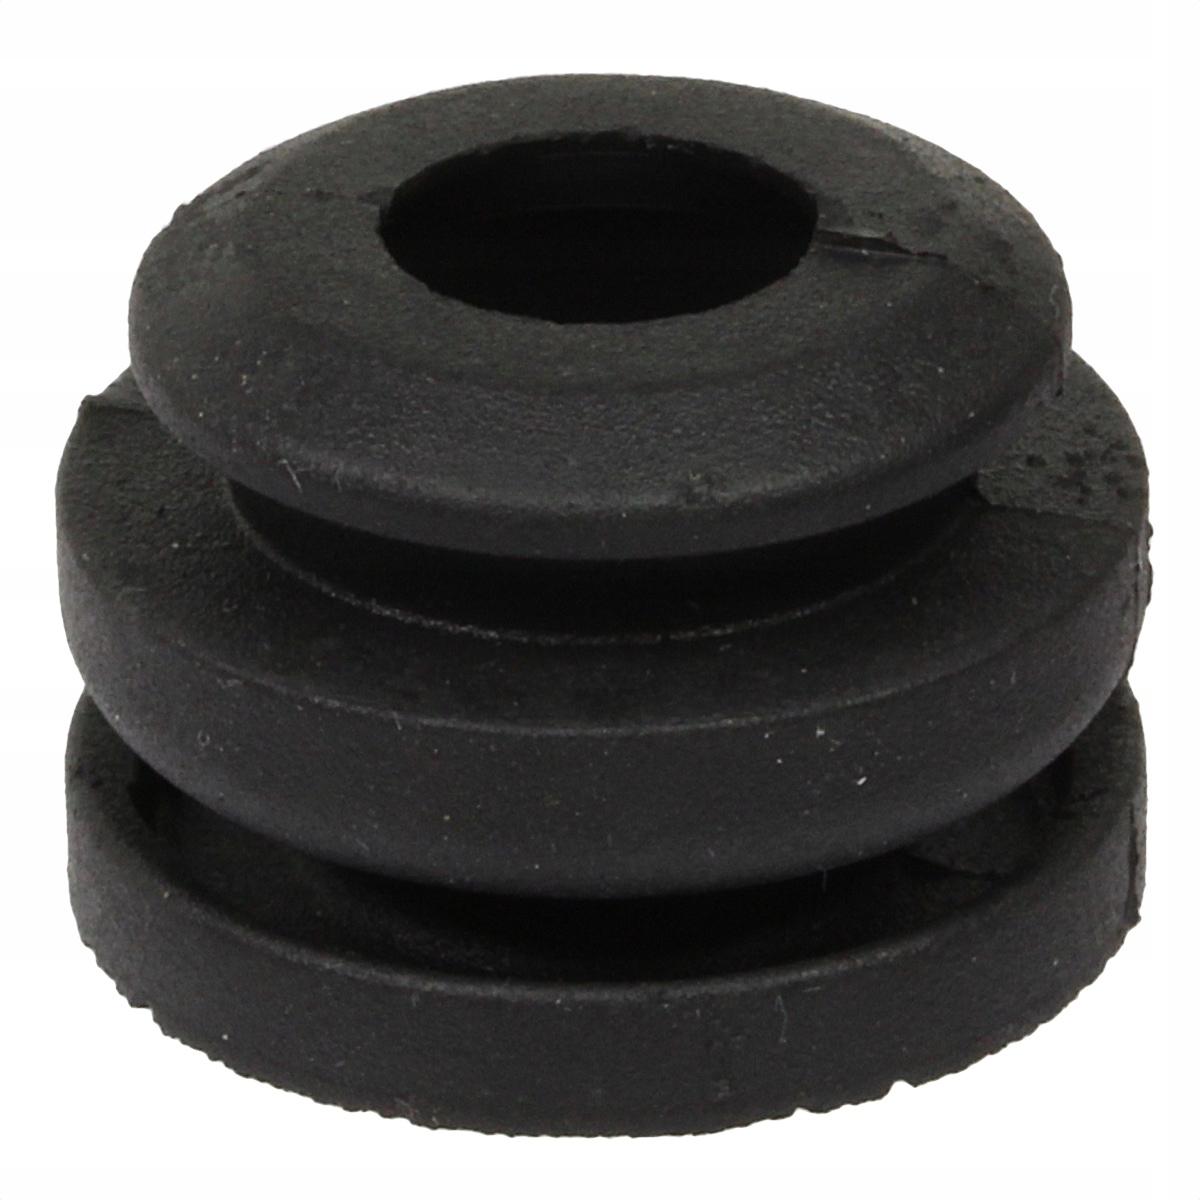 резина втулка крышки двигателя audi a3 a4 b6 a6 c5